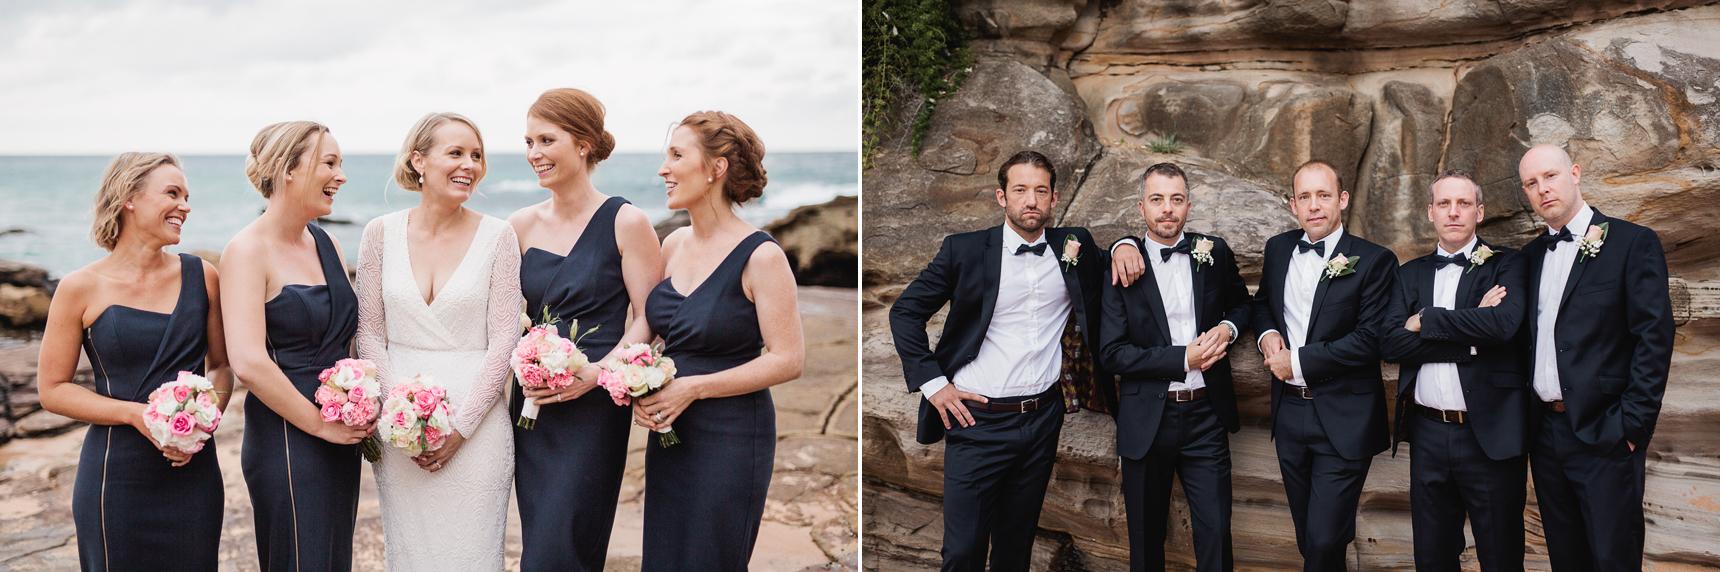 AngeRuss_MobyDicks_WhaleBeach_Wedding_Photography034.jpg